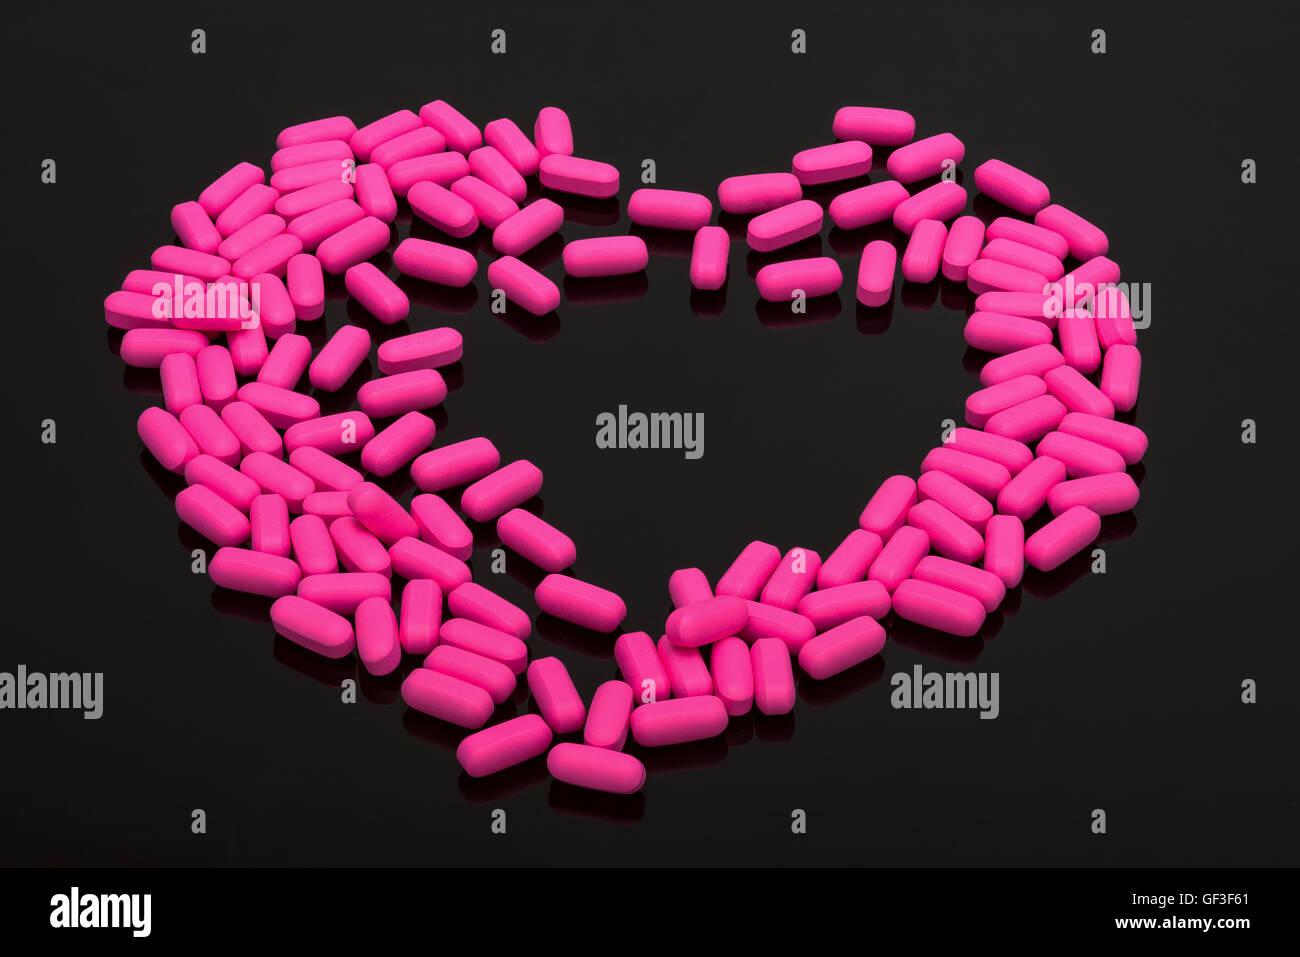 Migraine Pills pink capsules vitamins on black background - Stock Image